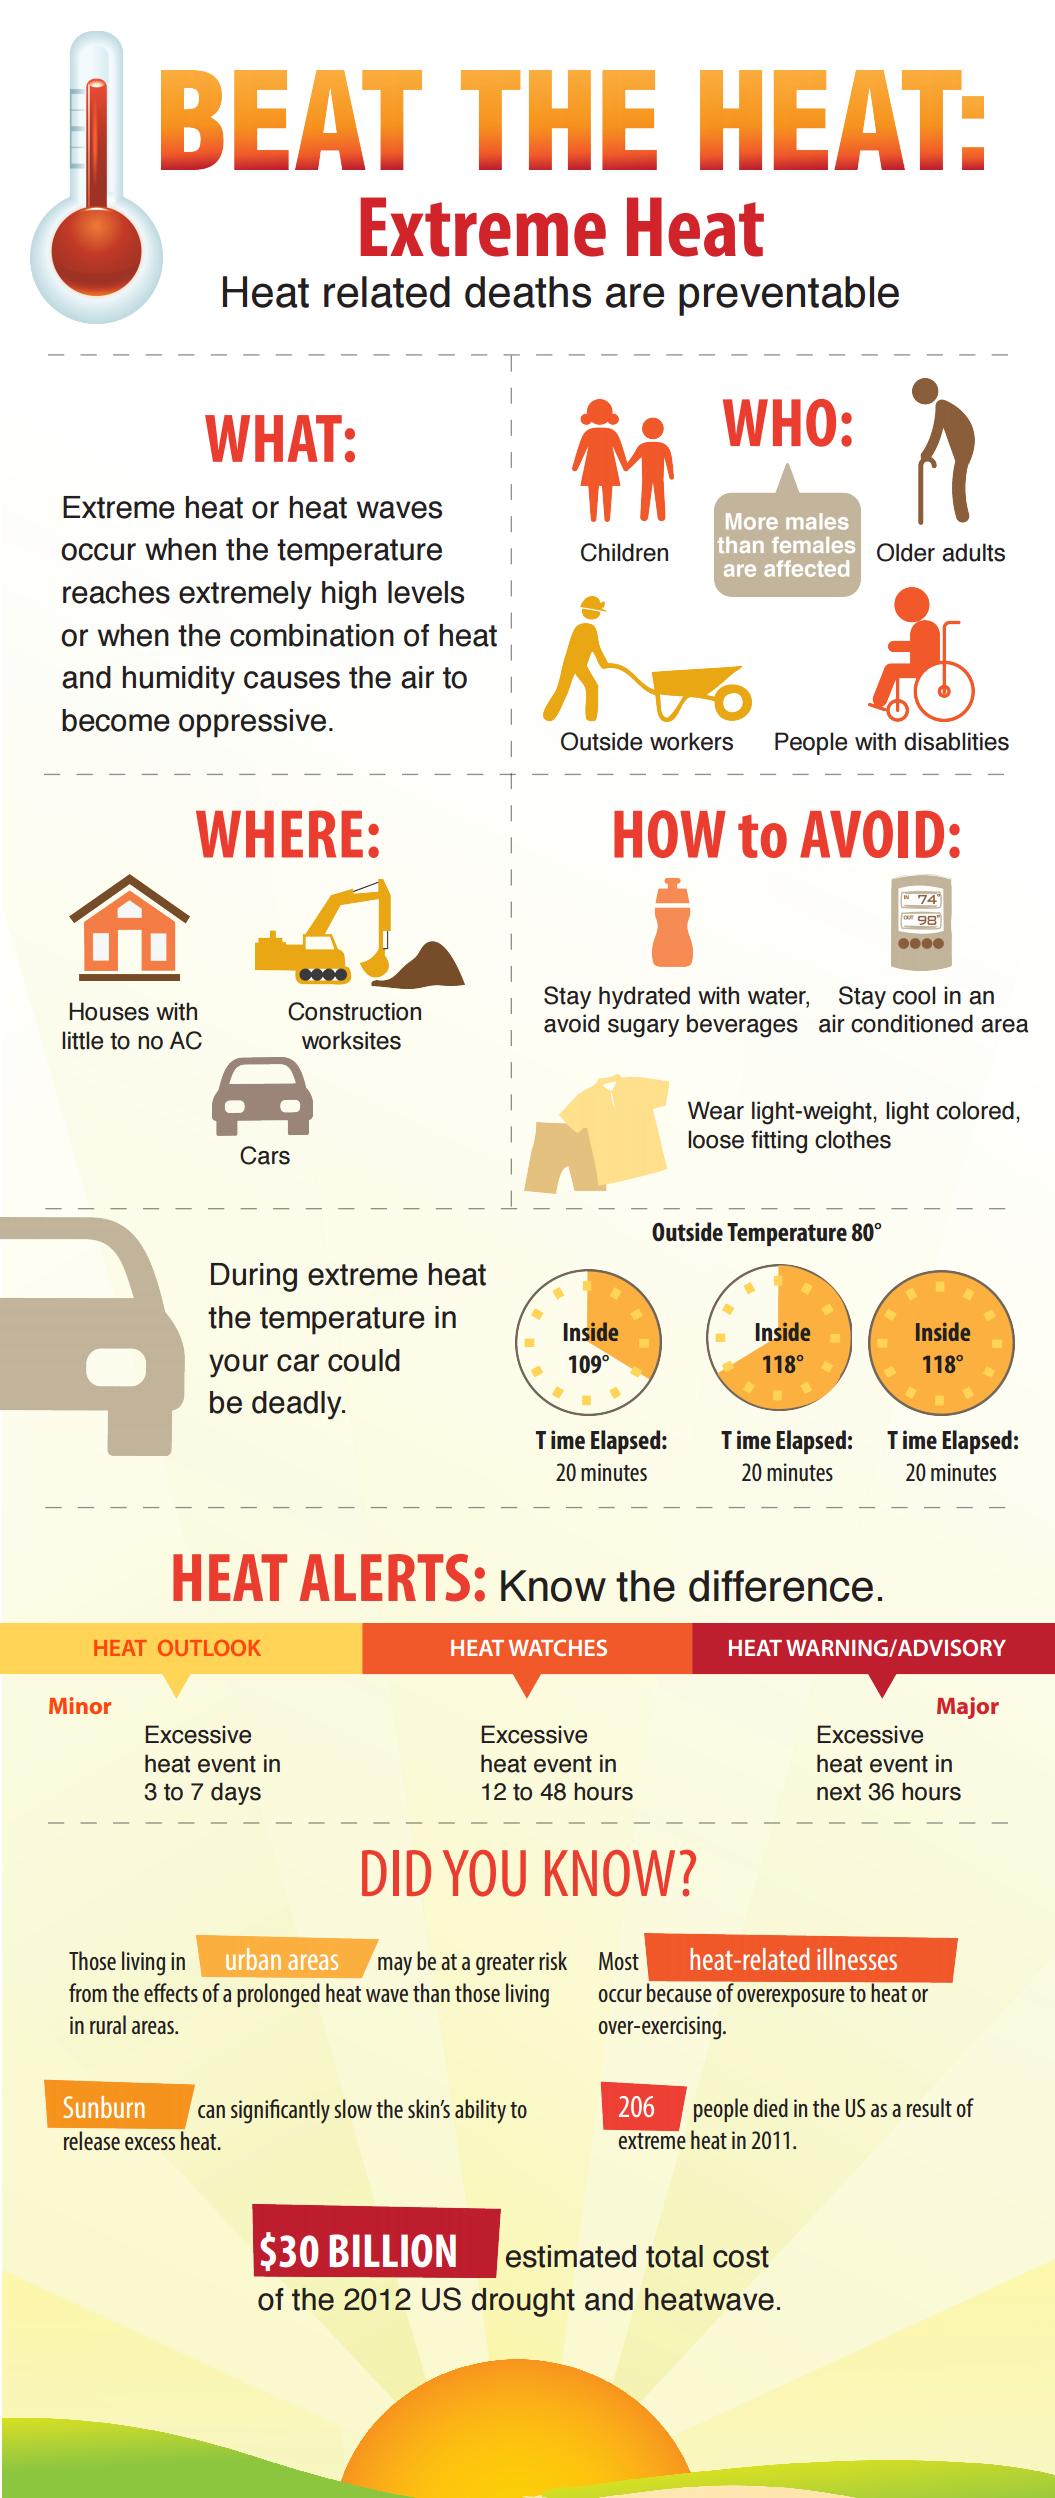 Beat the Heat: Extreme Heat Infographic